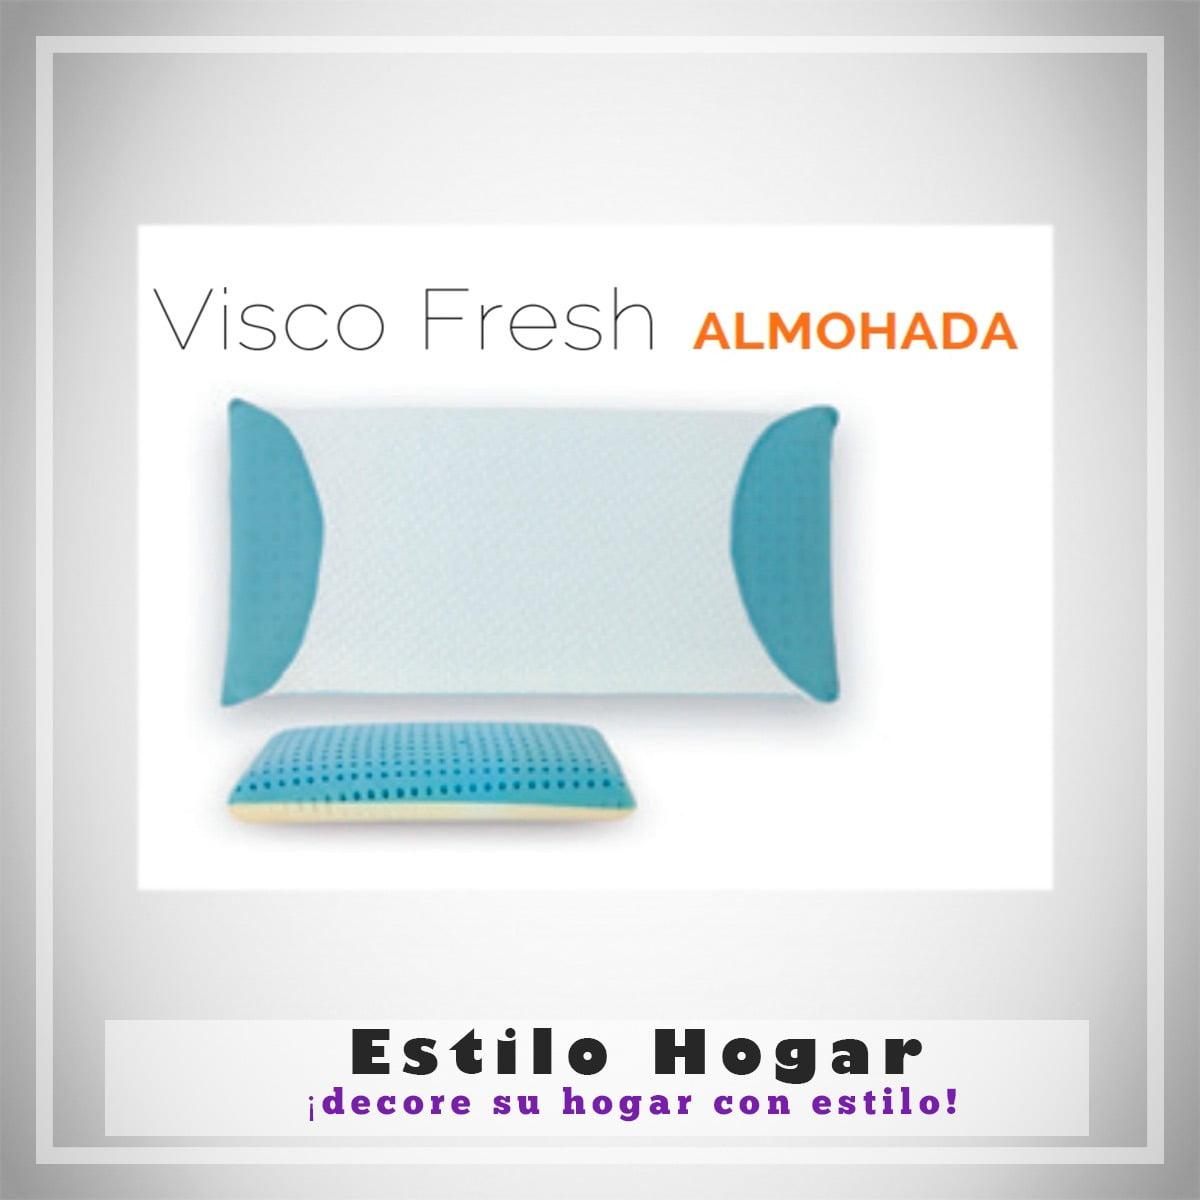 Funda Almohada VISCO FRESH